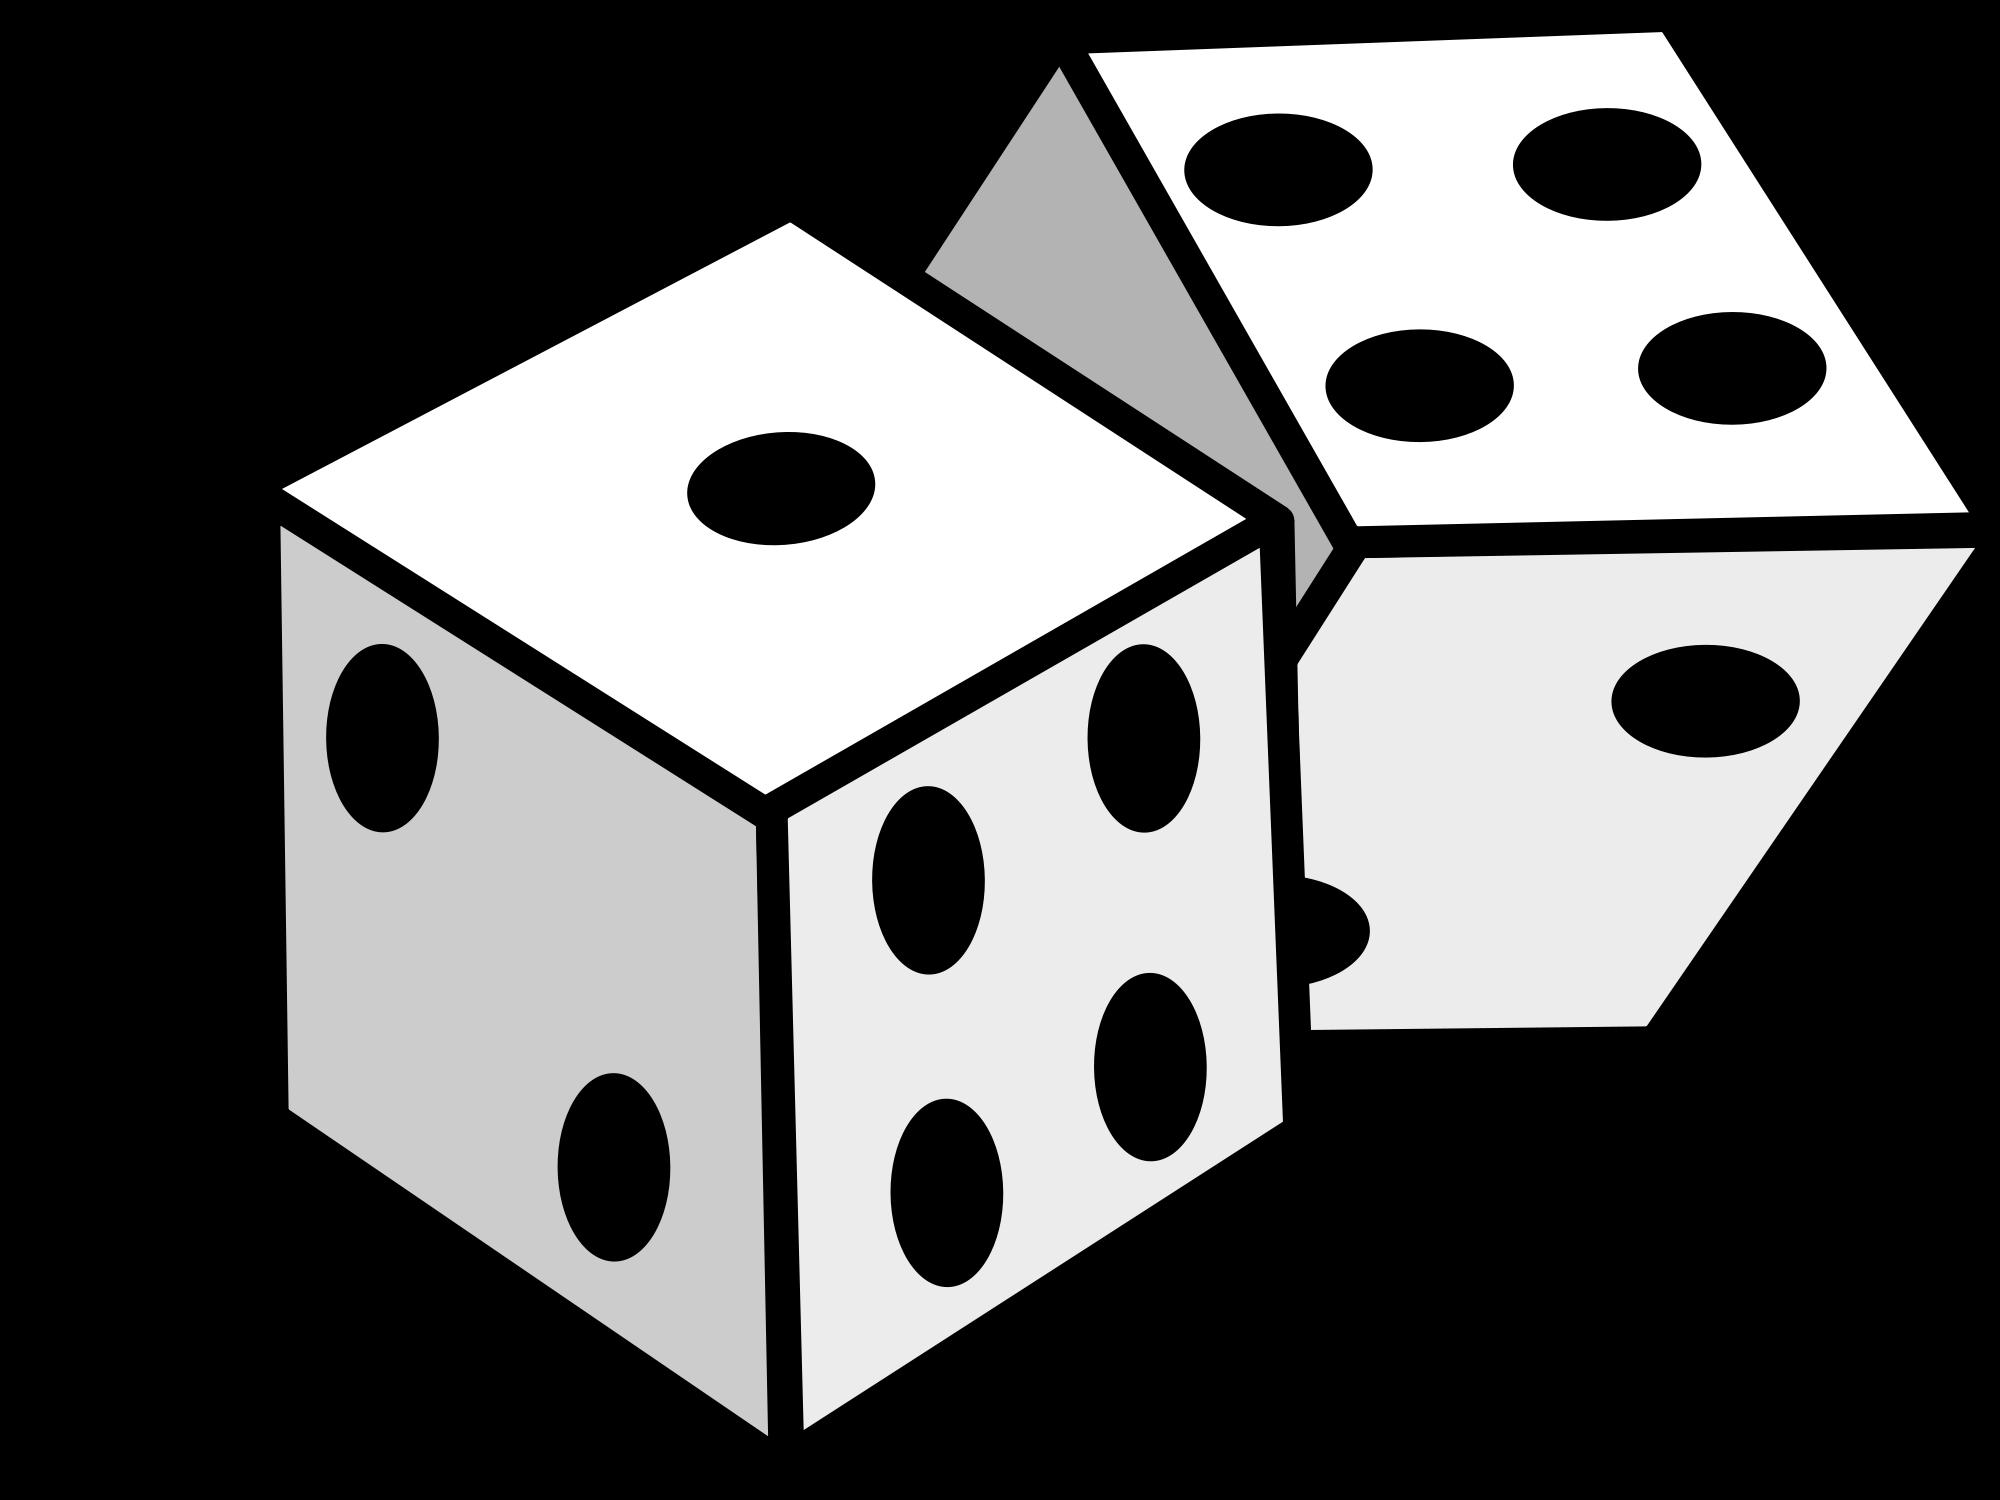 royalty free Probability theory Mathematics Probability and statistics